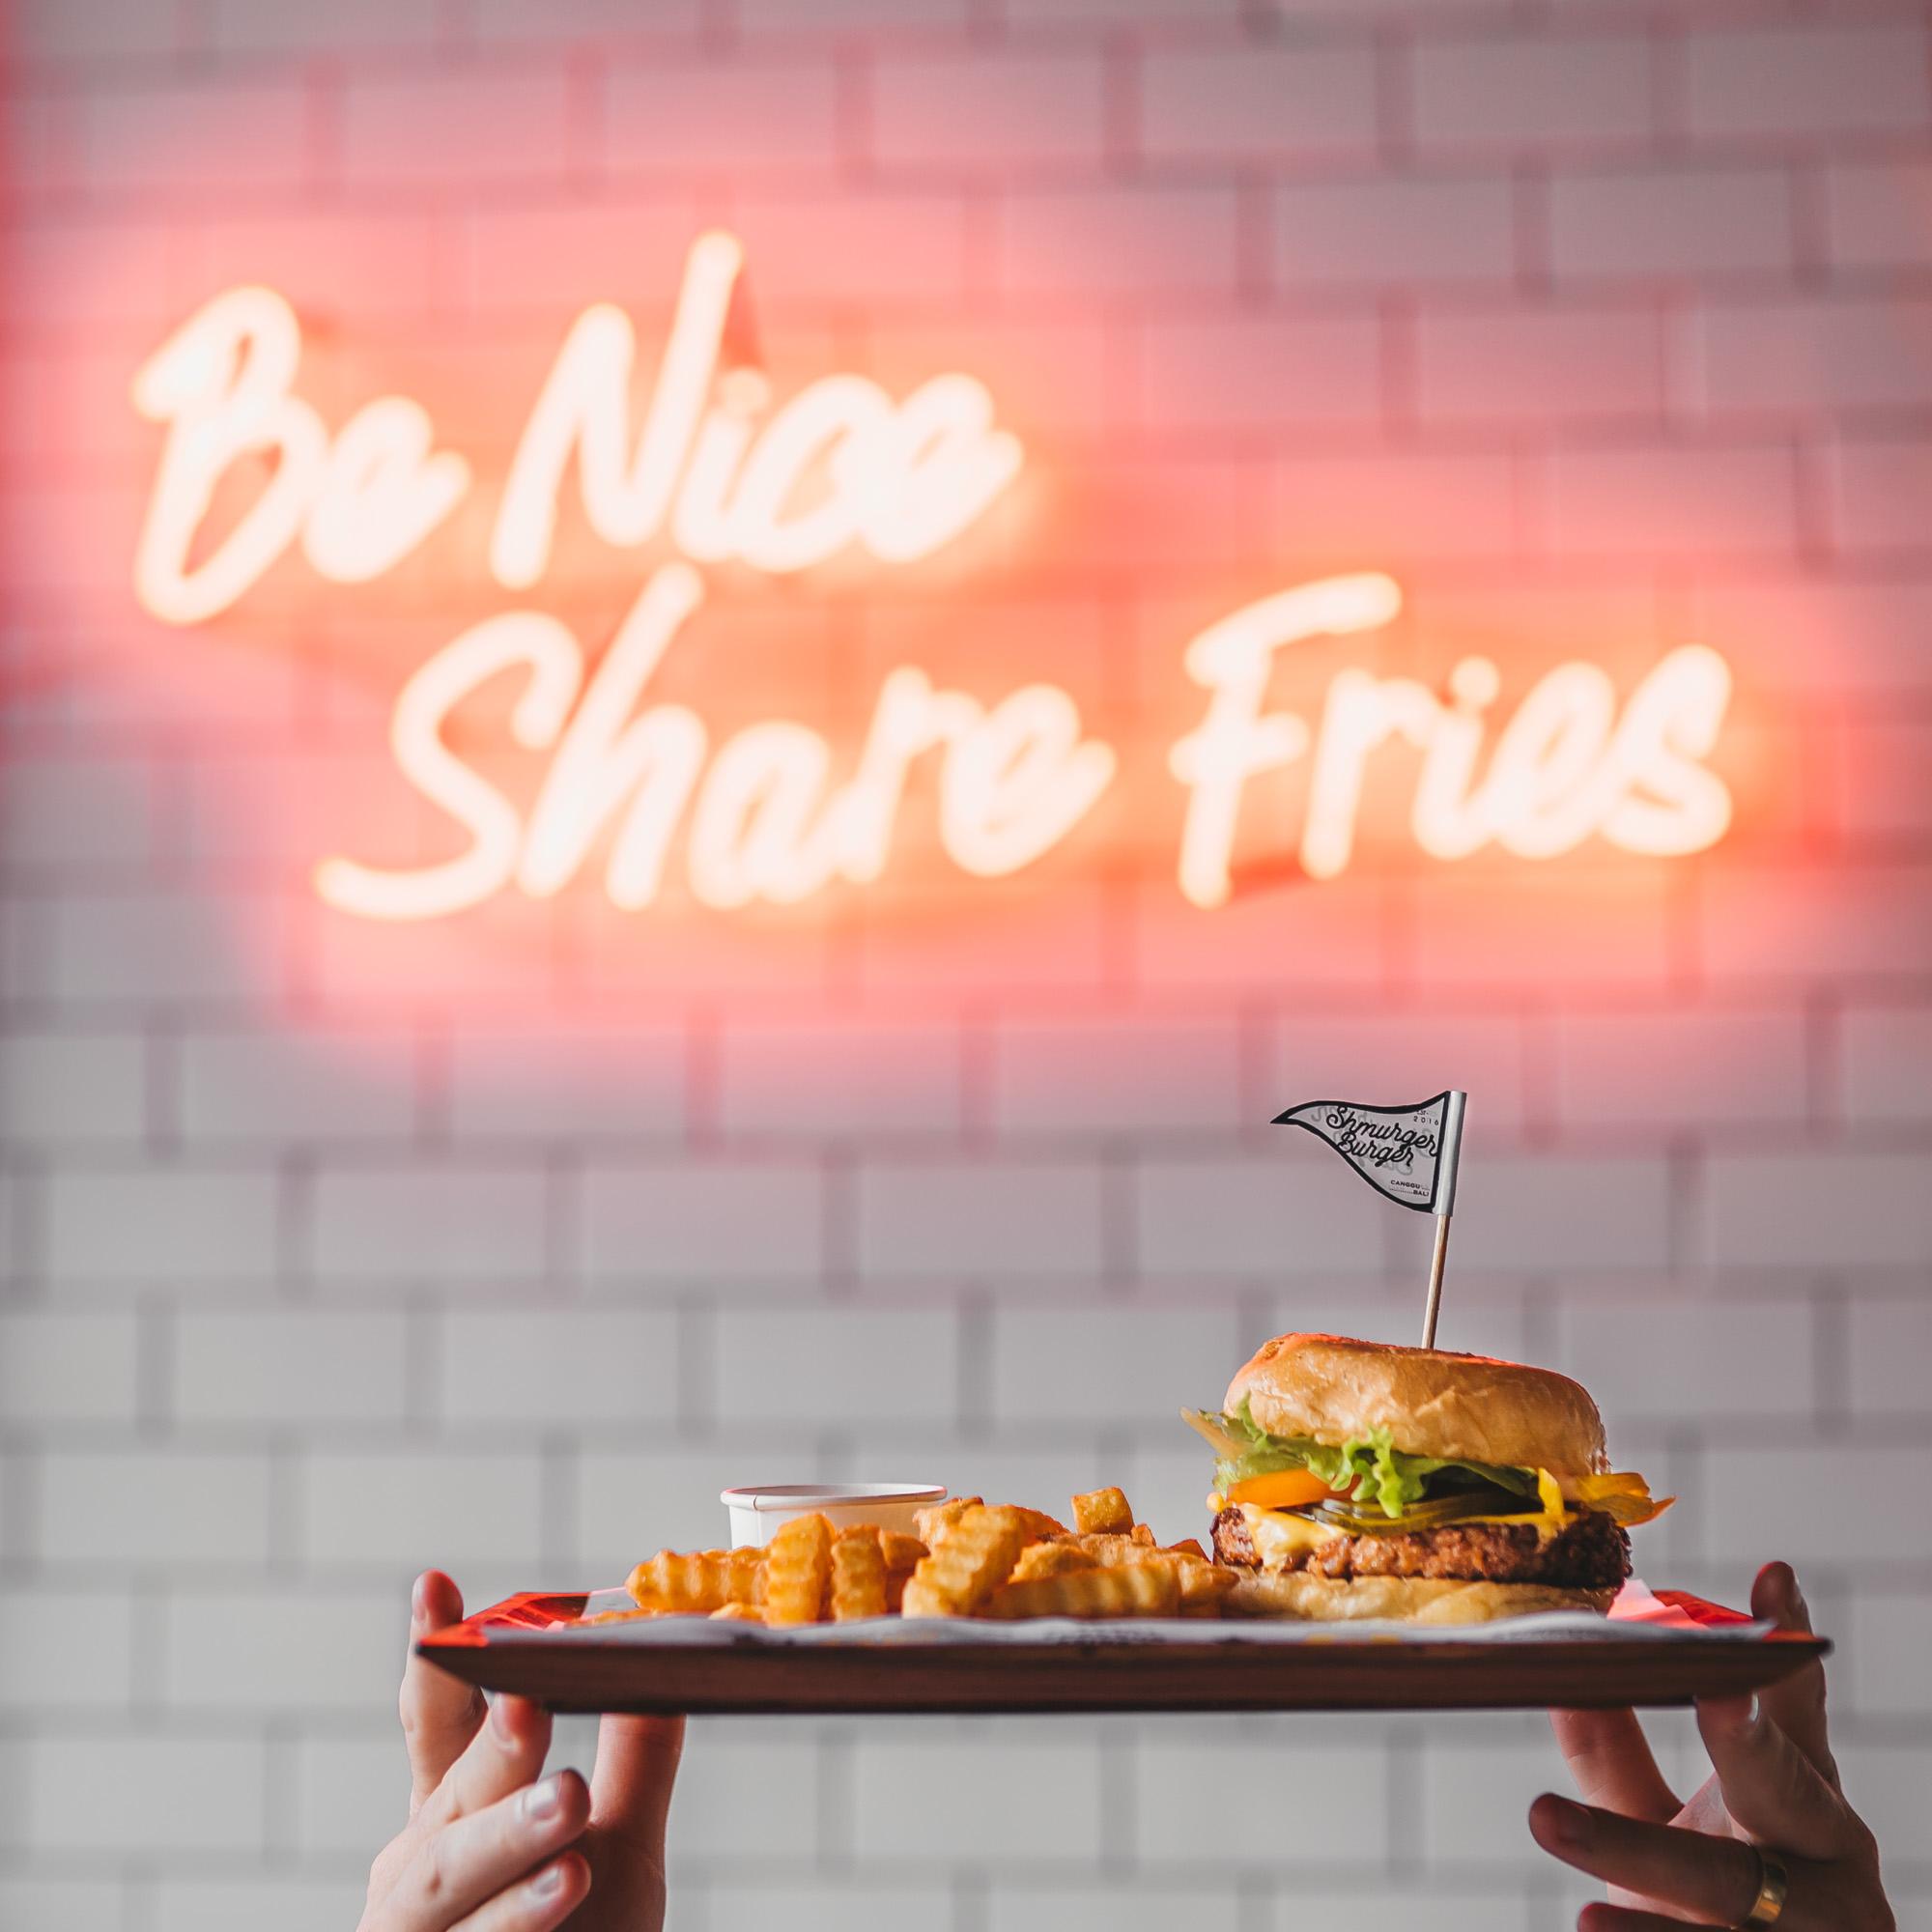 keira-mason-shmurger-burger-neon-sign.jpg